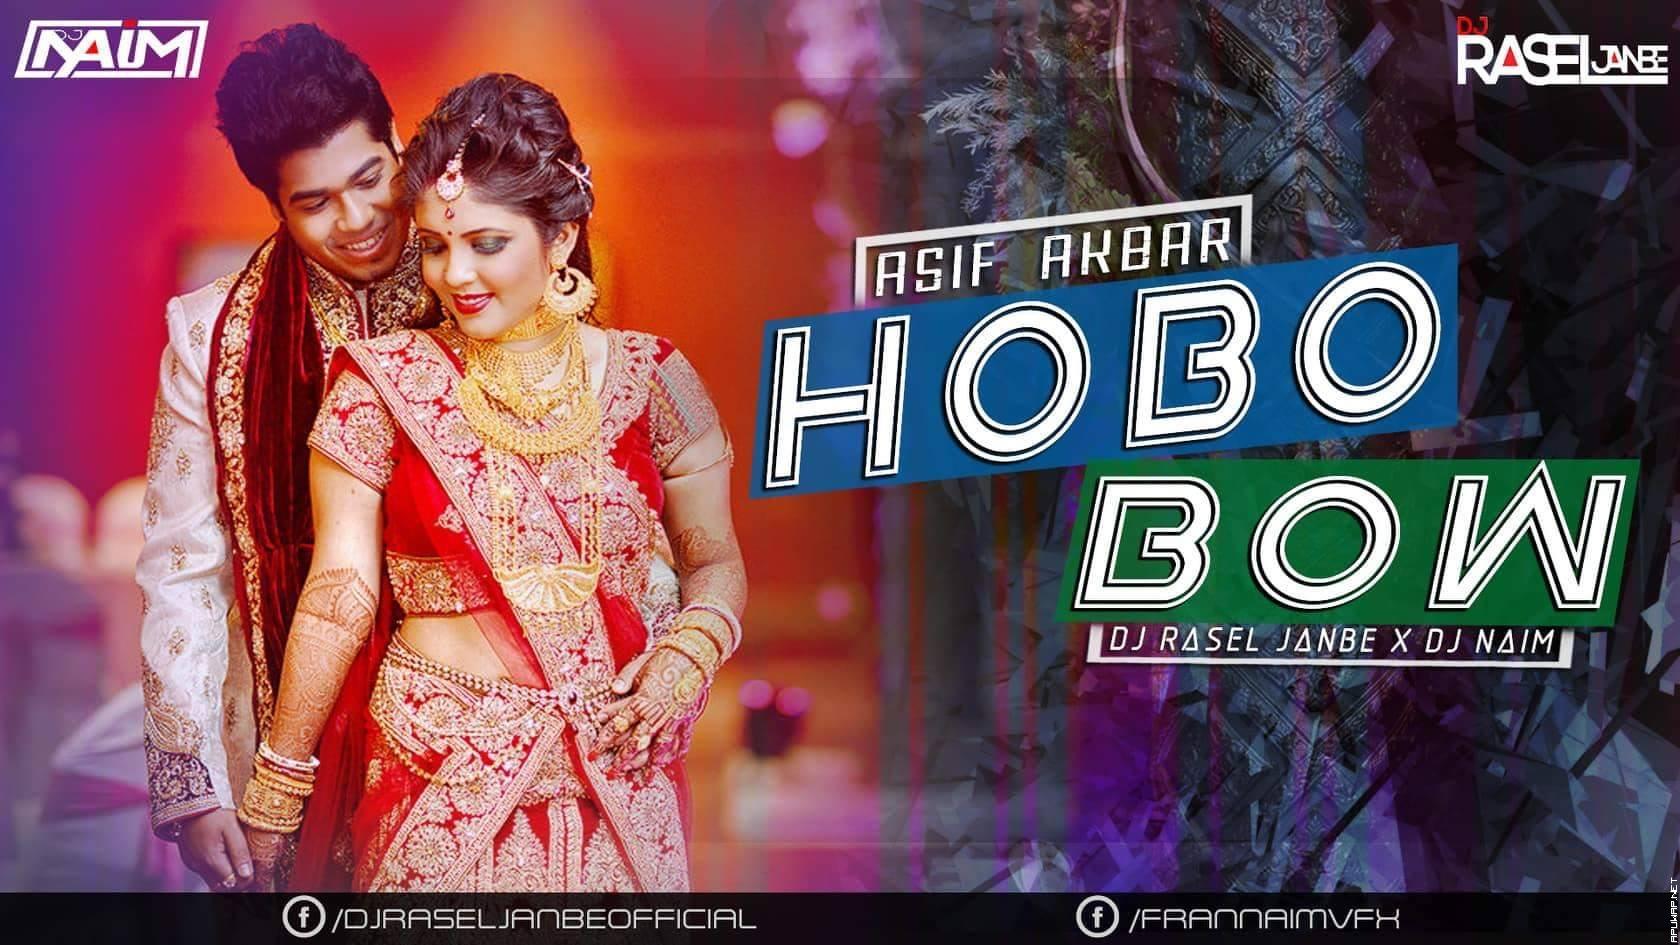 Hobo Bow By Asif Akbar (Hot Tapori Mix) DJ RASEL JANBE X DJ NAIM.mp3